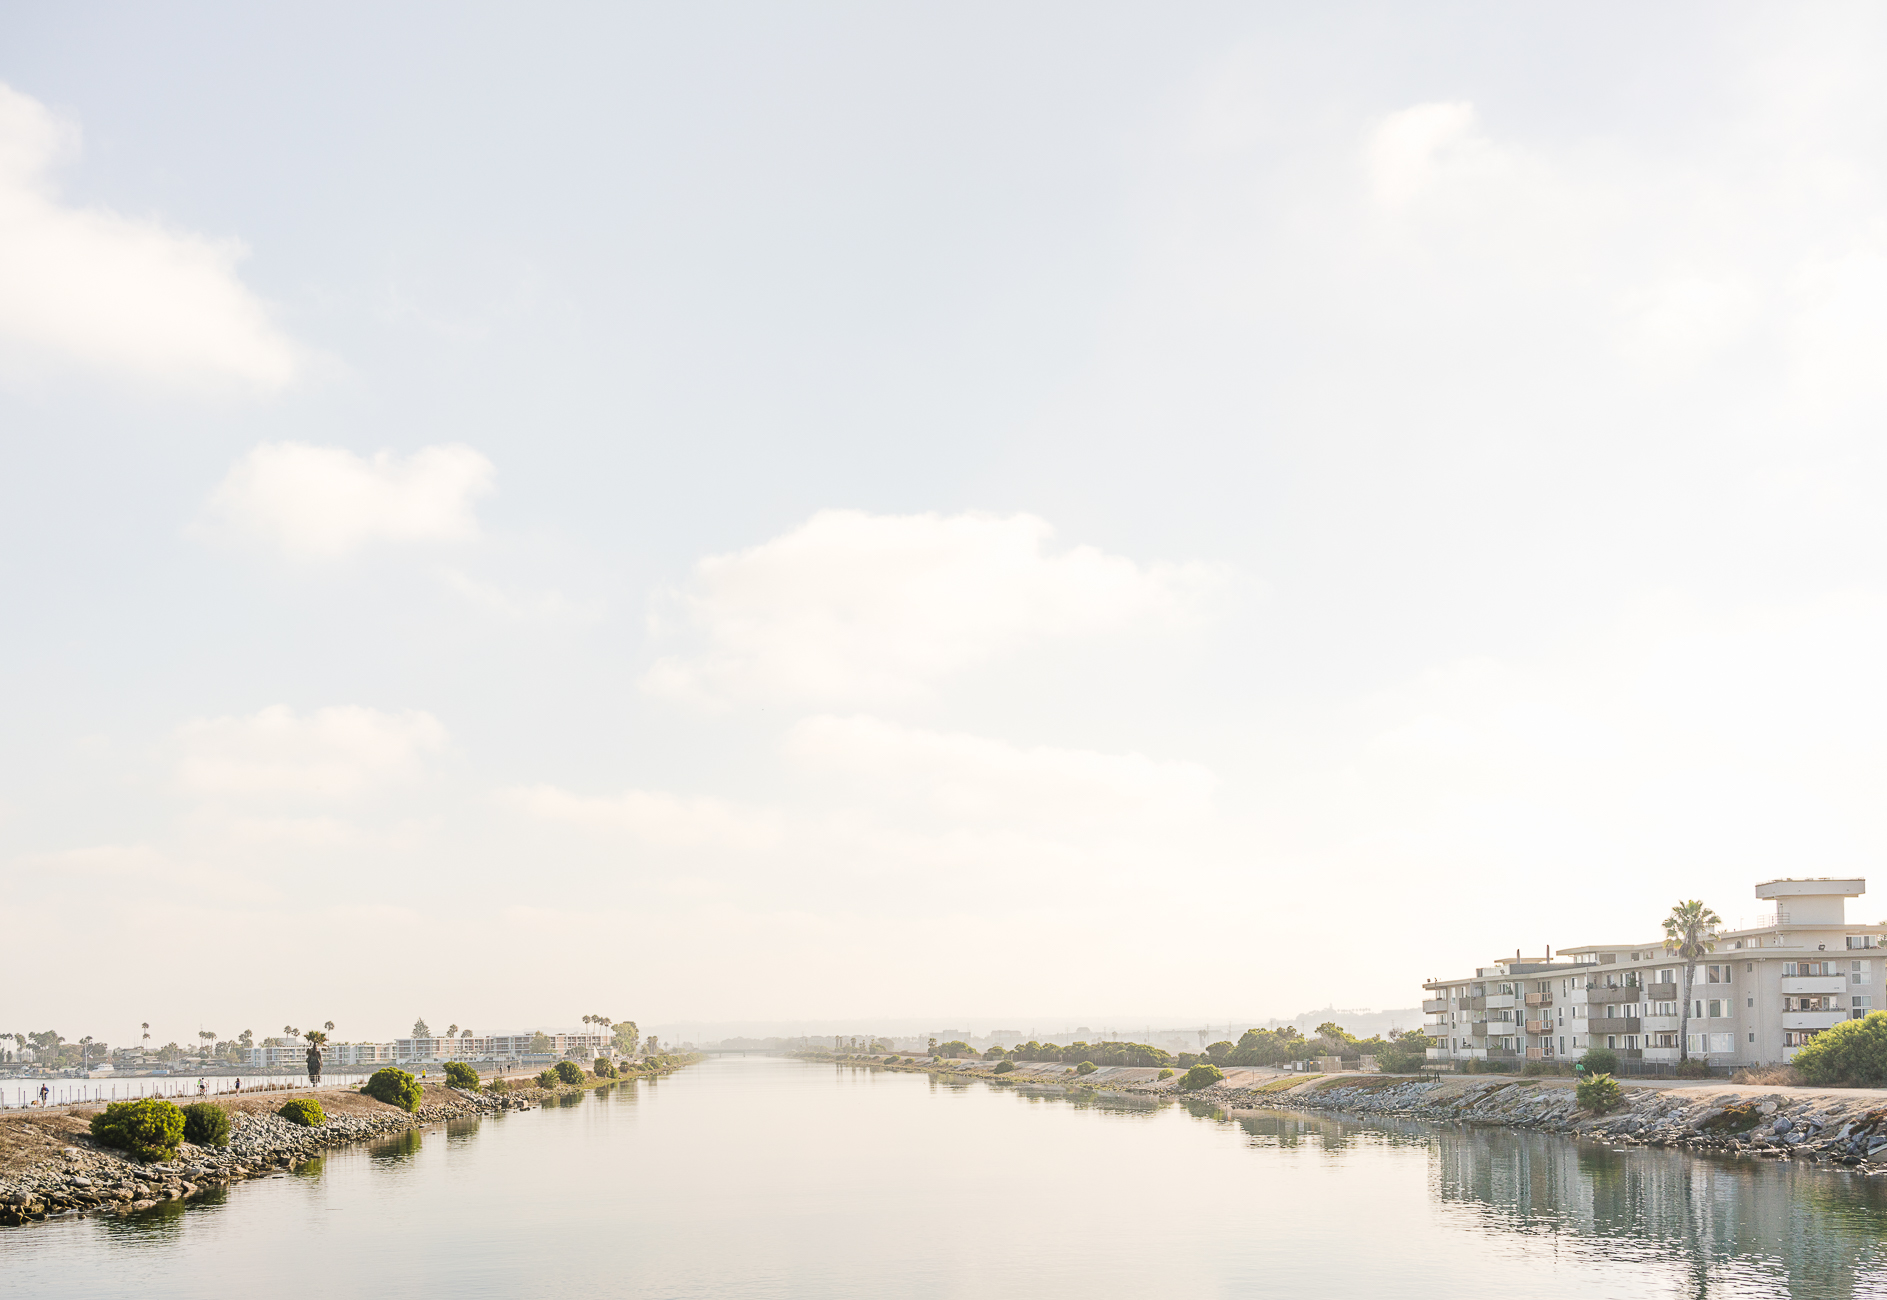 Marina Del Ray / See & Savour